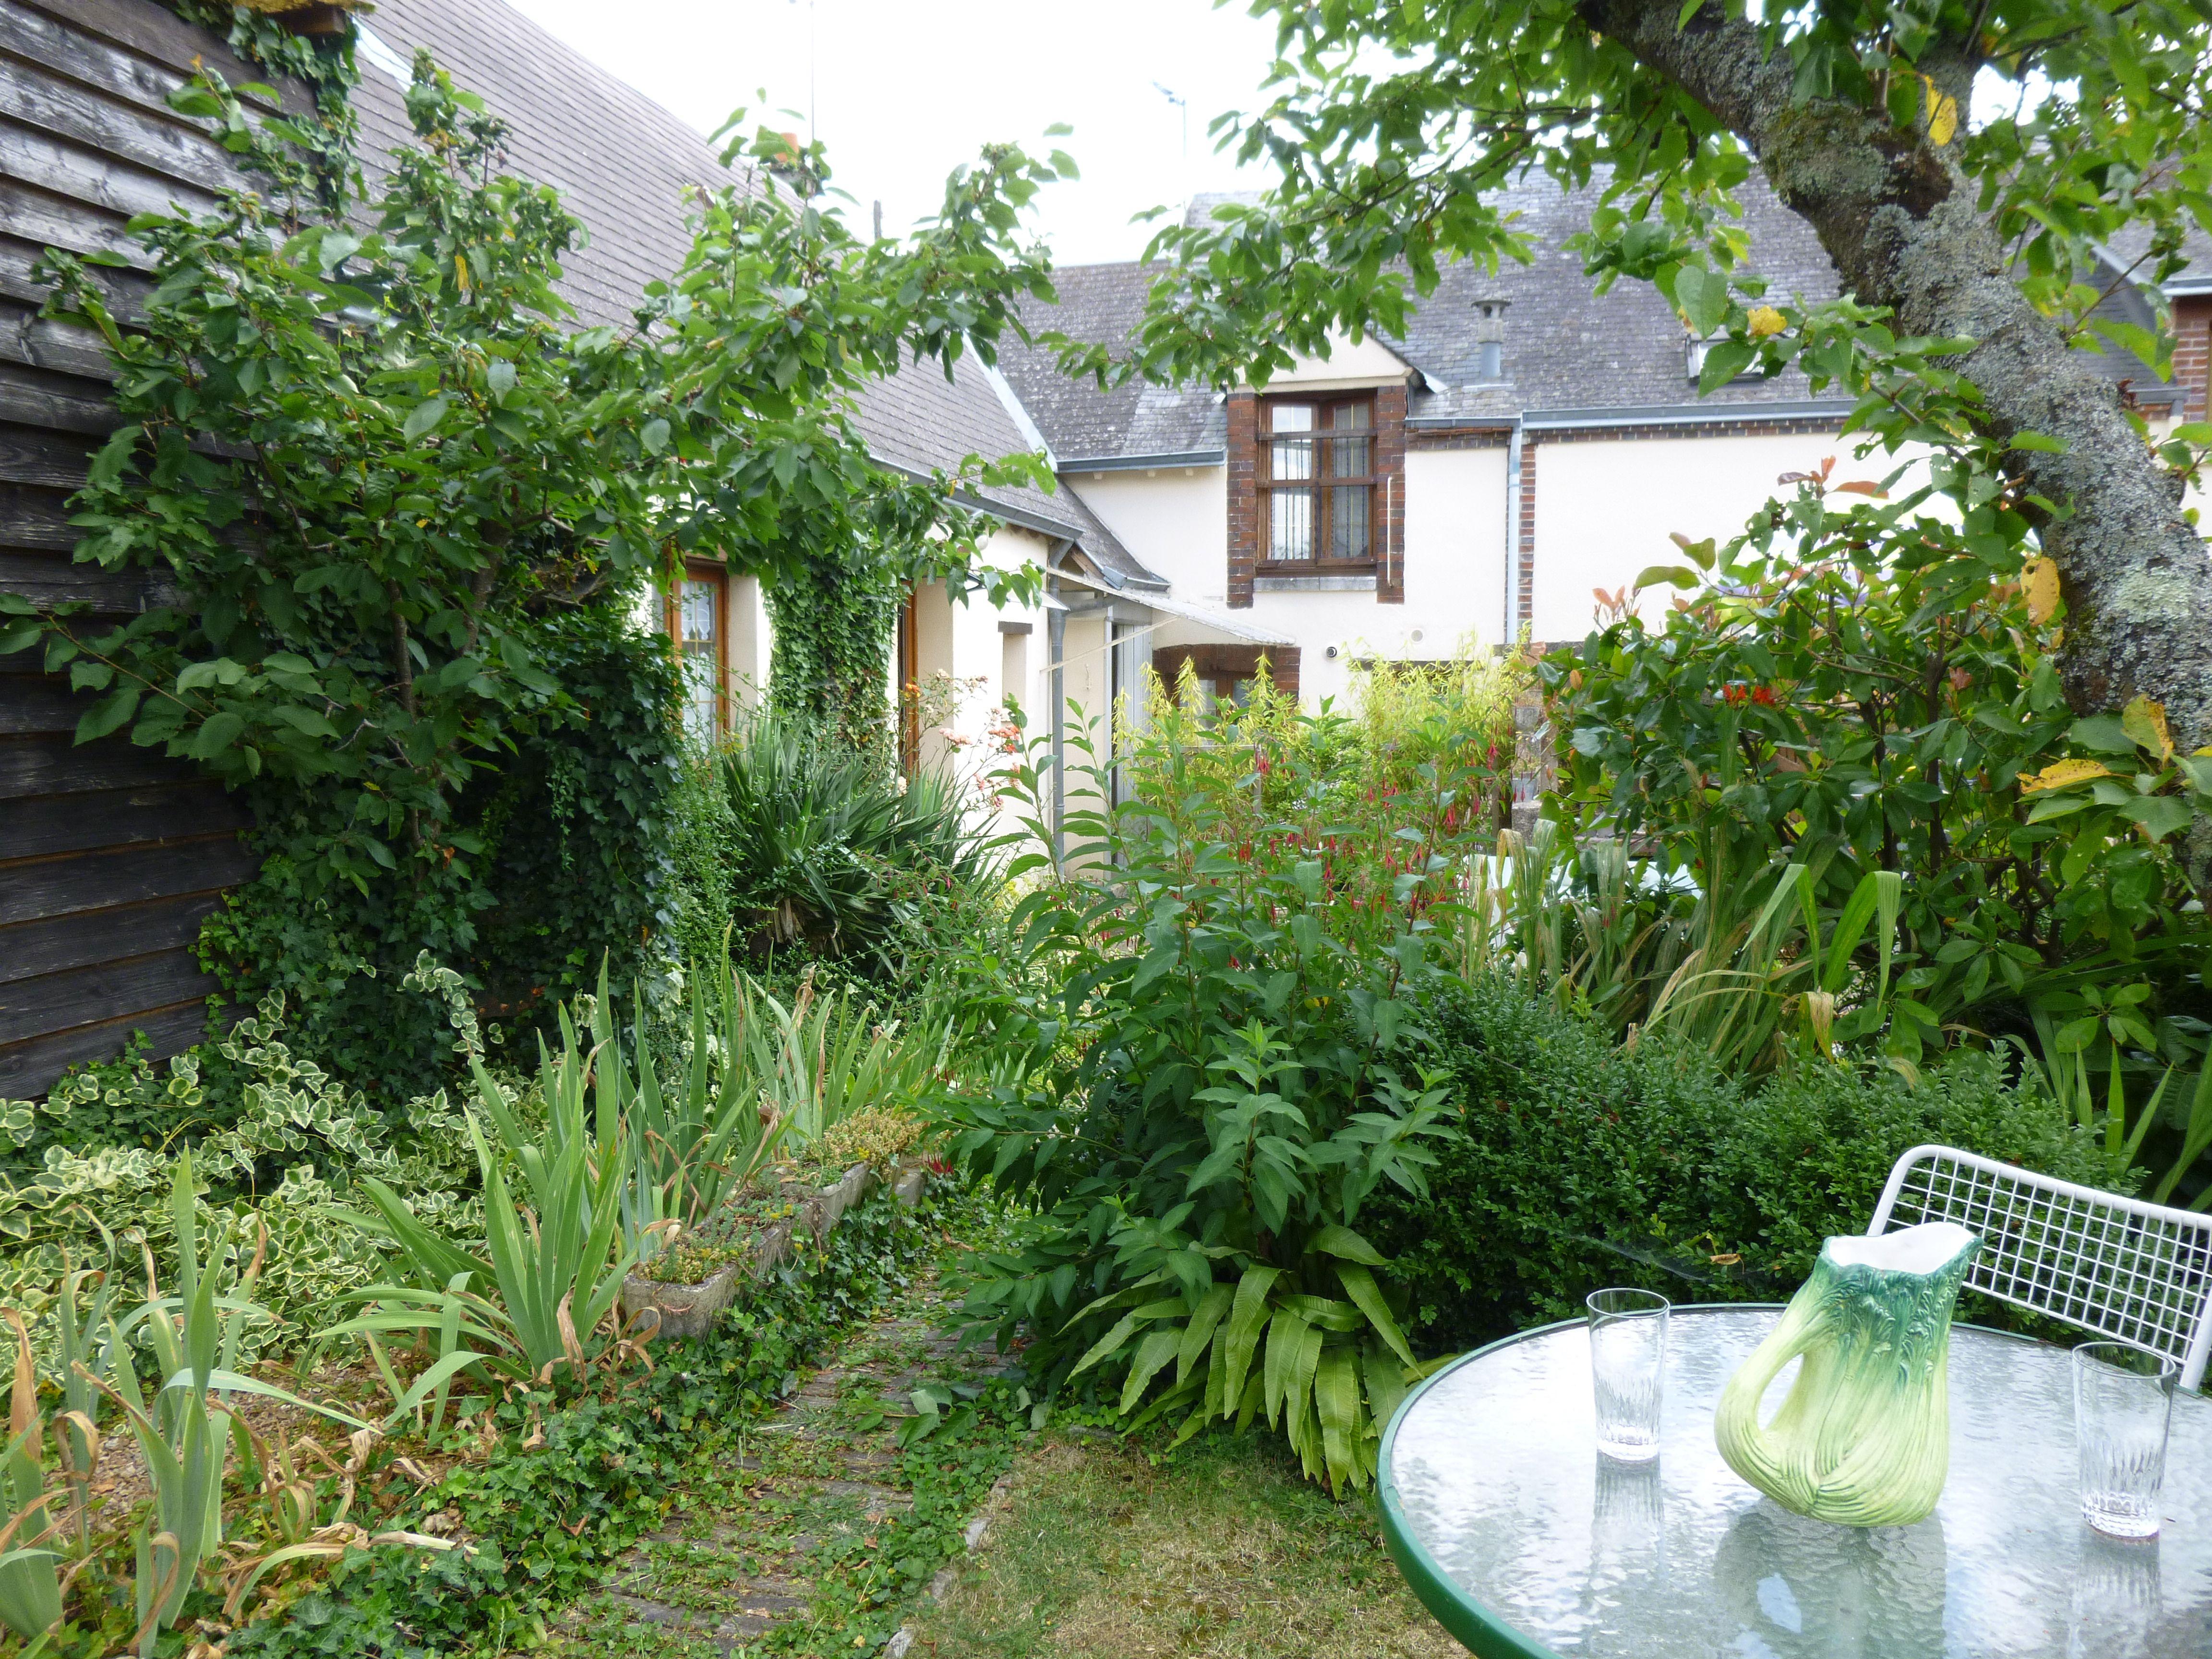 Un jardin fleuri avec terrasse, barbecue et local pêche